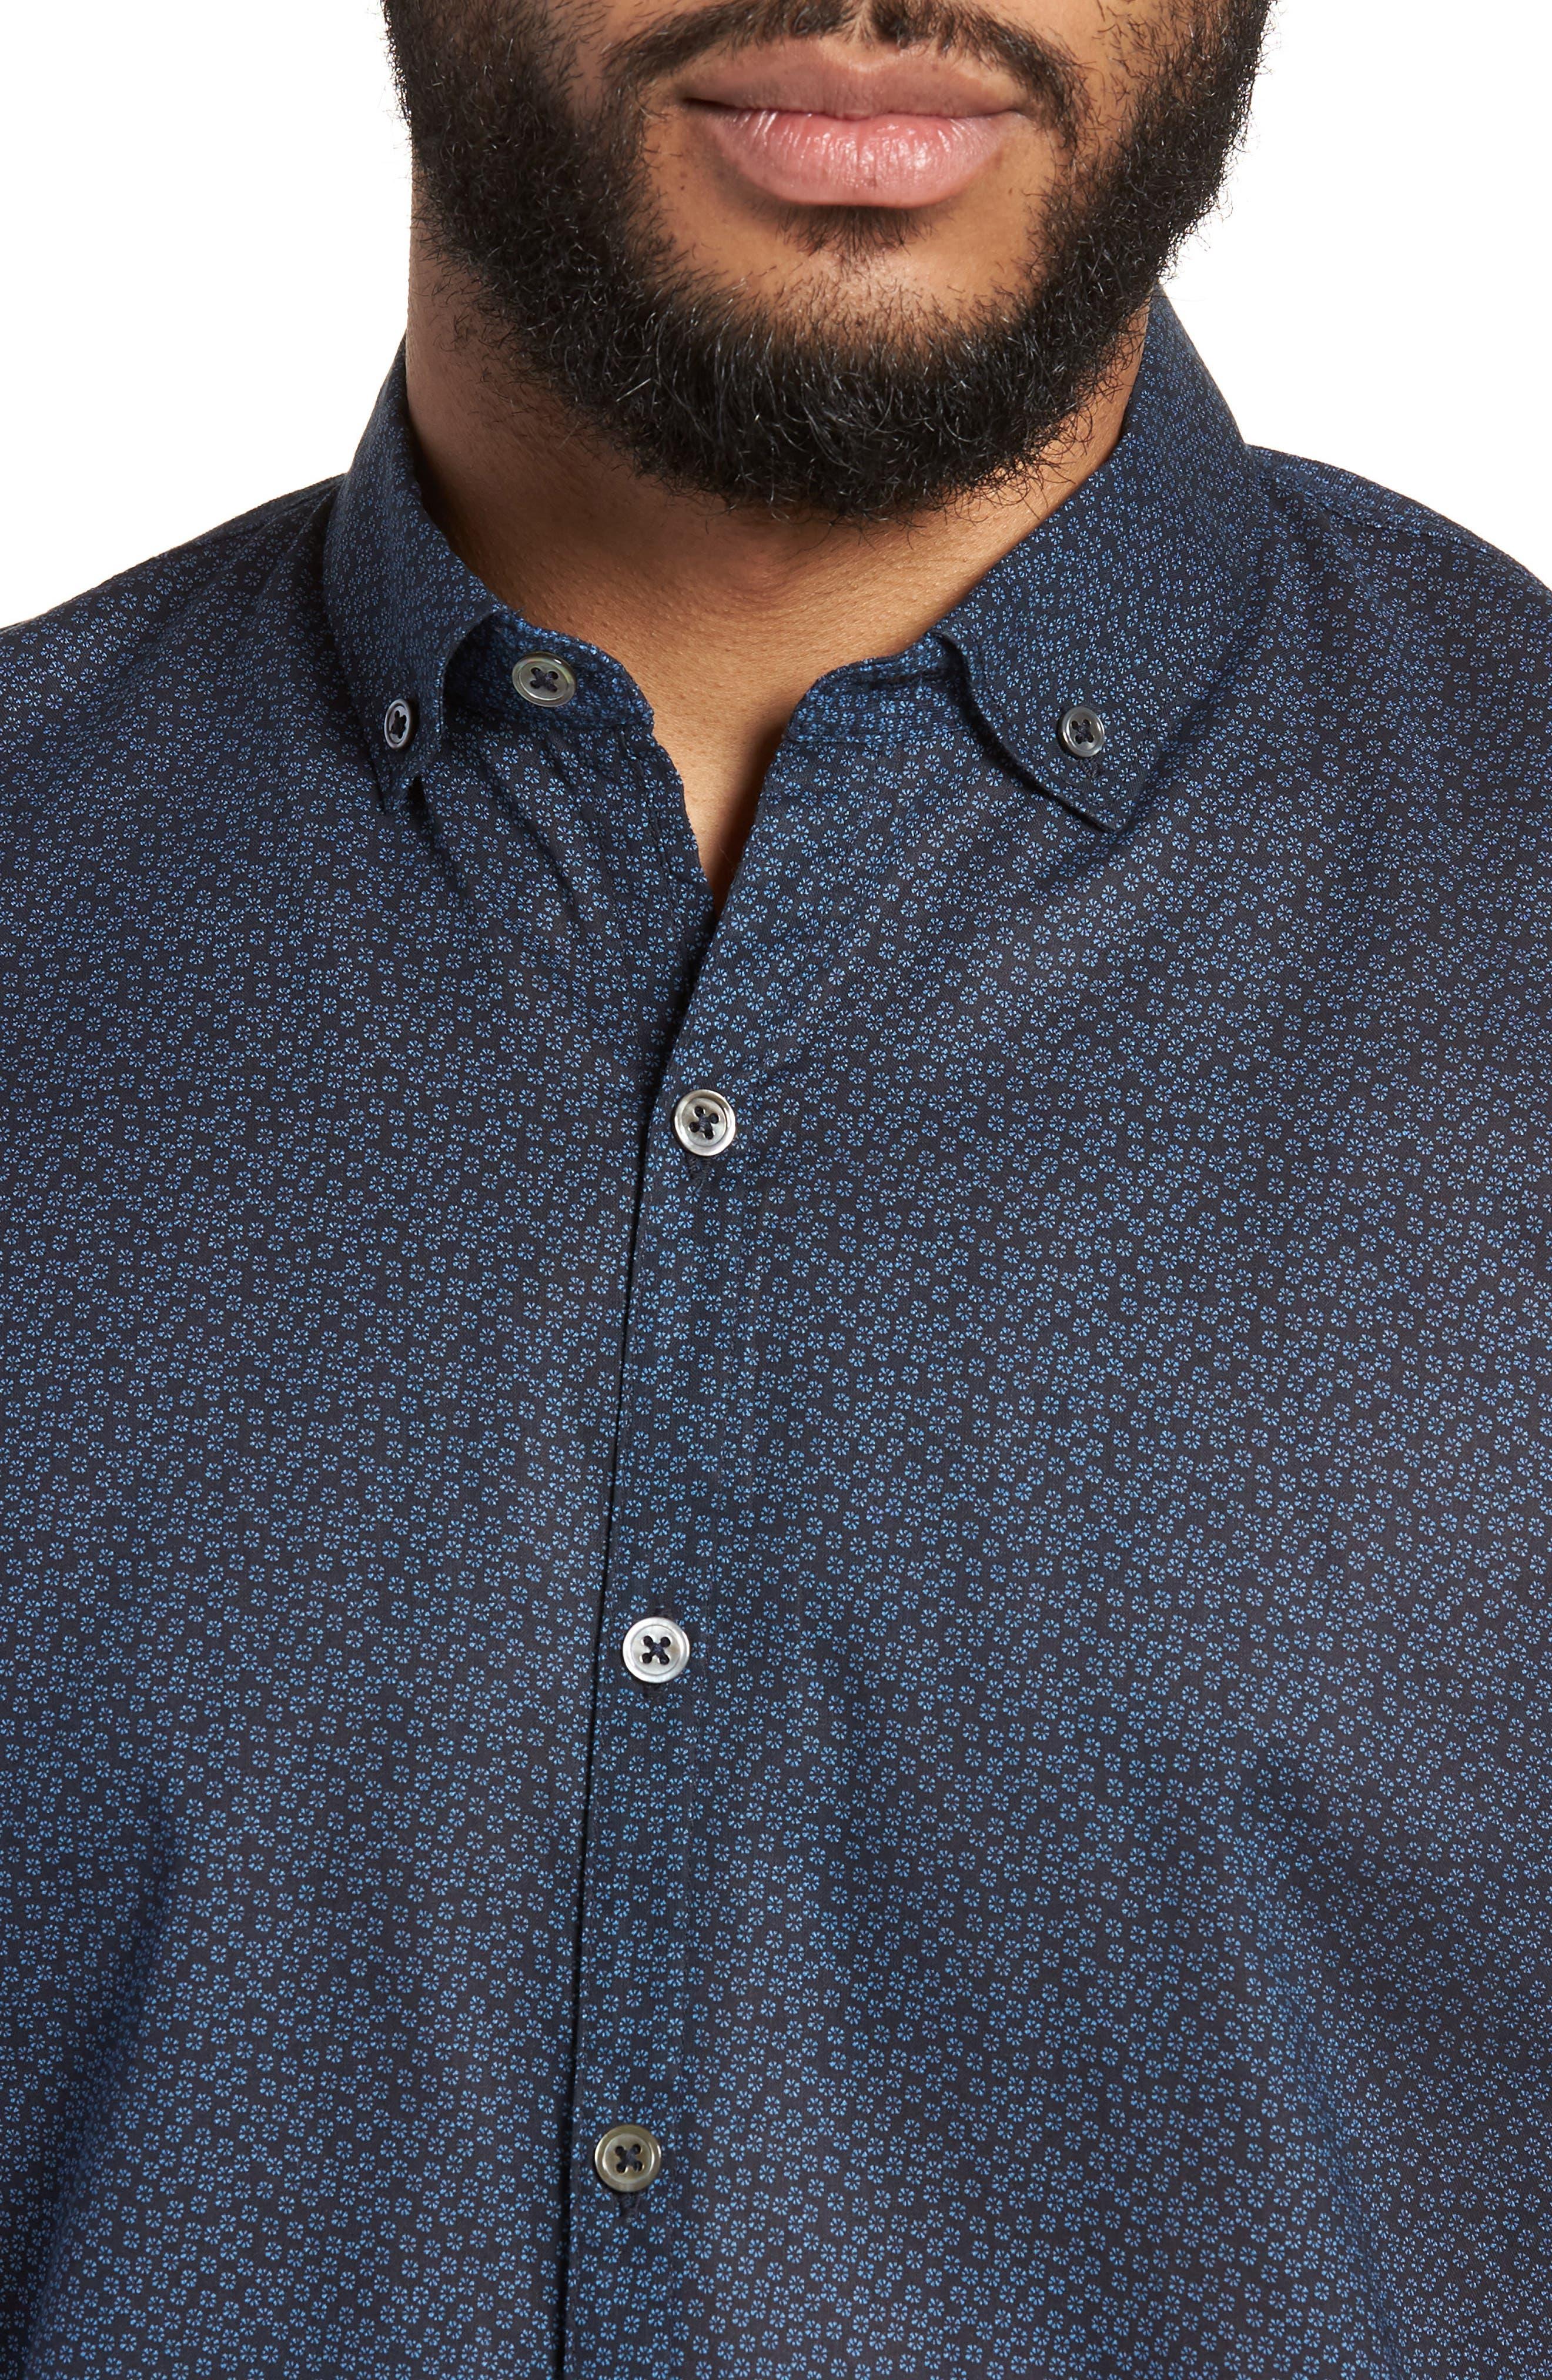 Clyde Slim Fit Sport Shirt,                             Alternate thumbnail 4, color,                             410